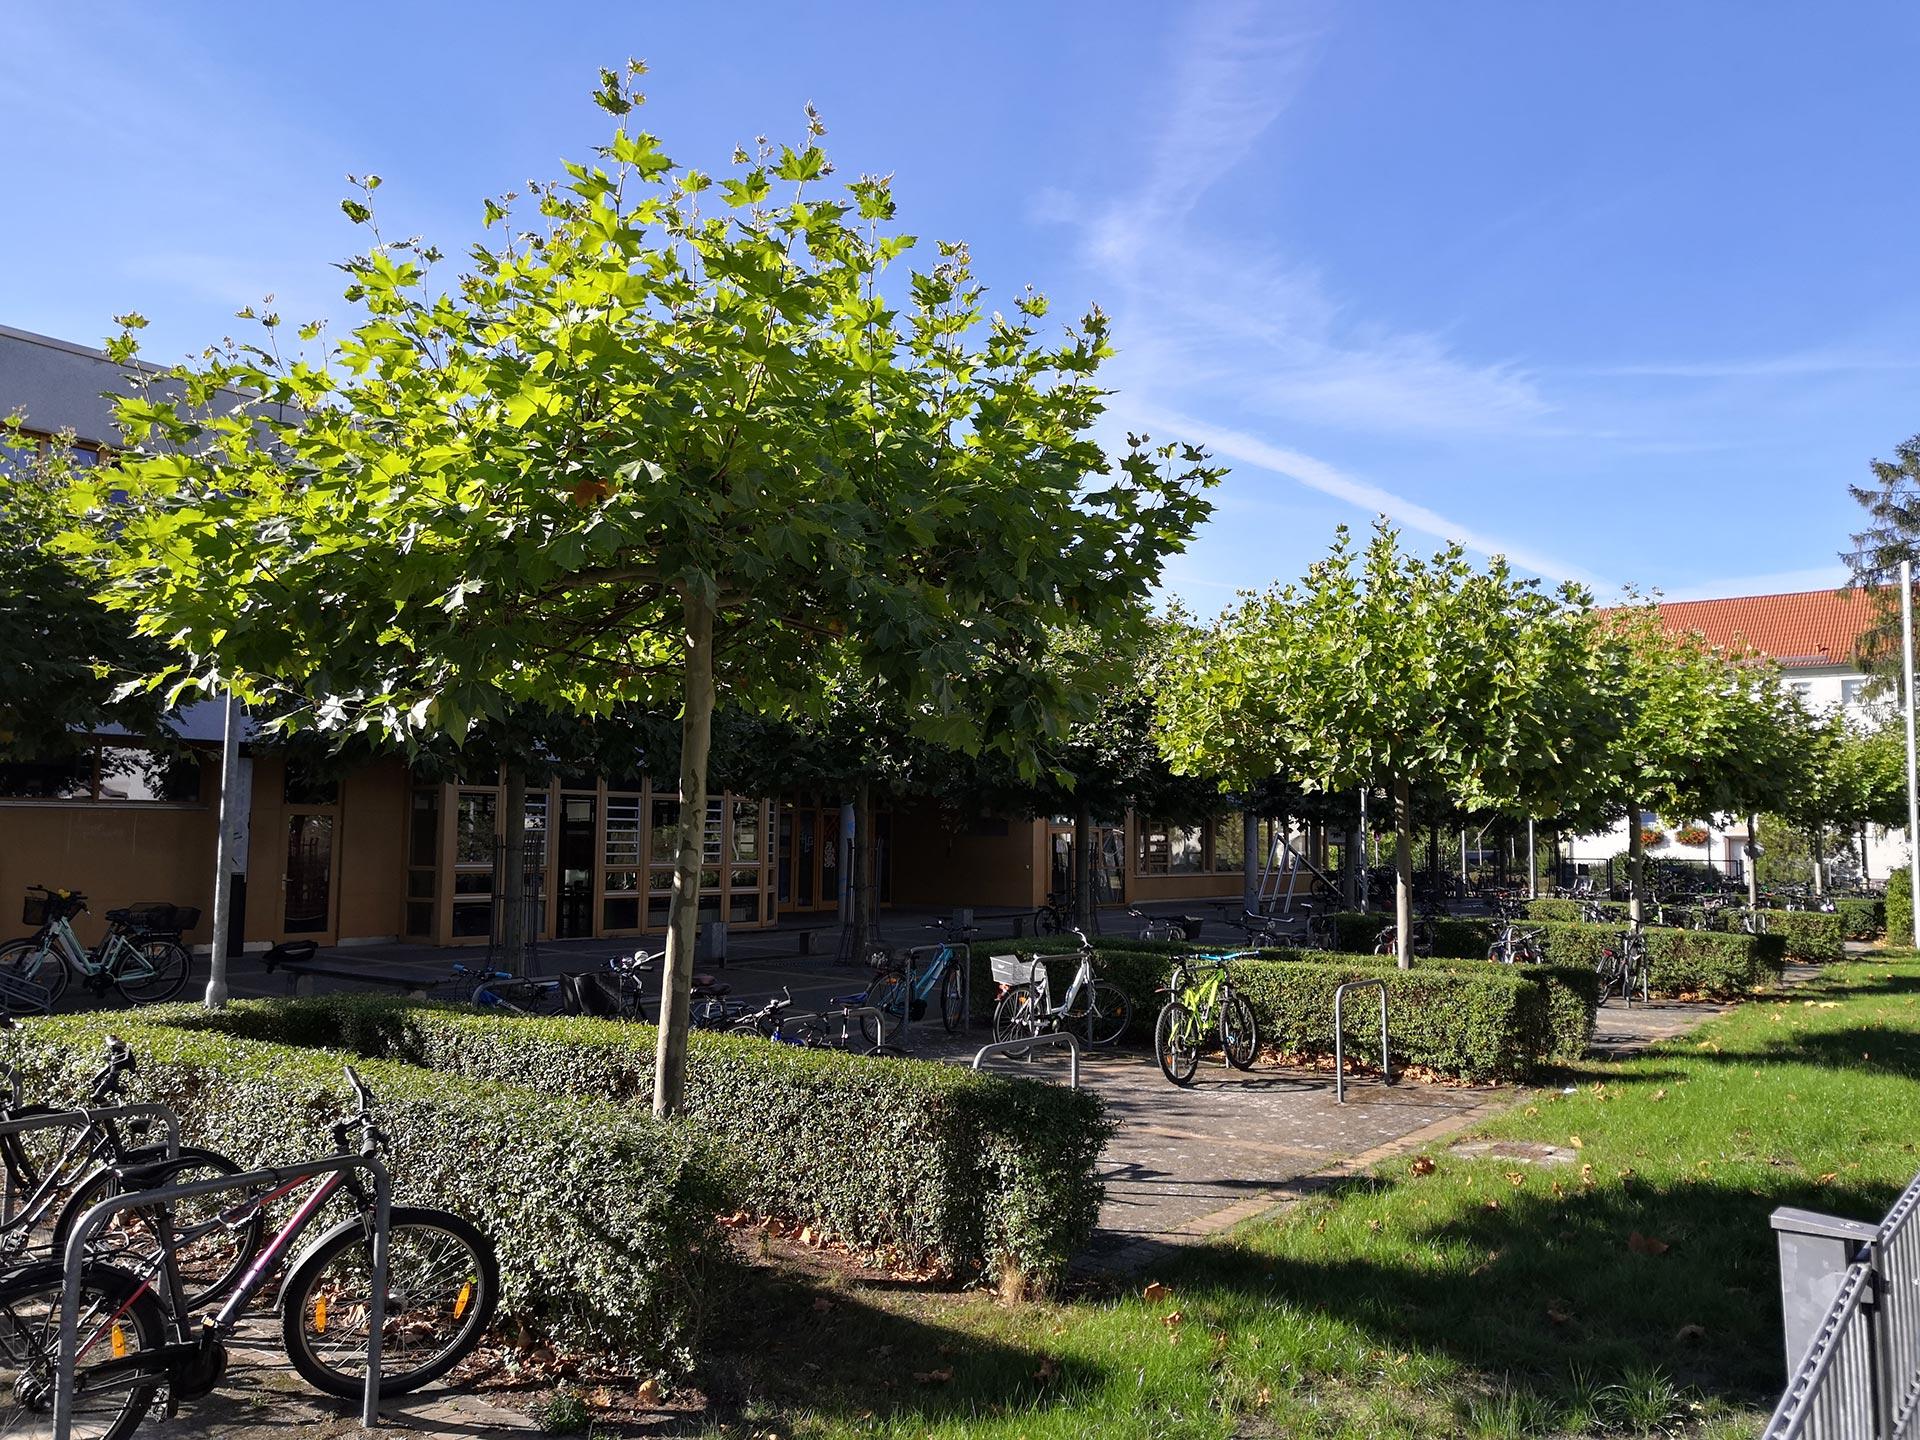 Fahrradständer am Hedwig Bollhagen Gymnasium